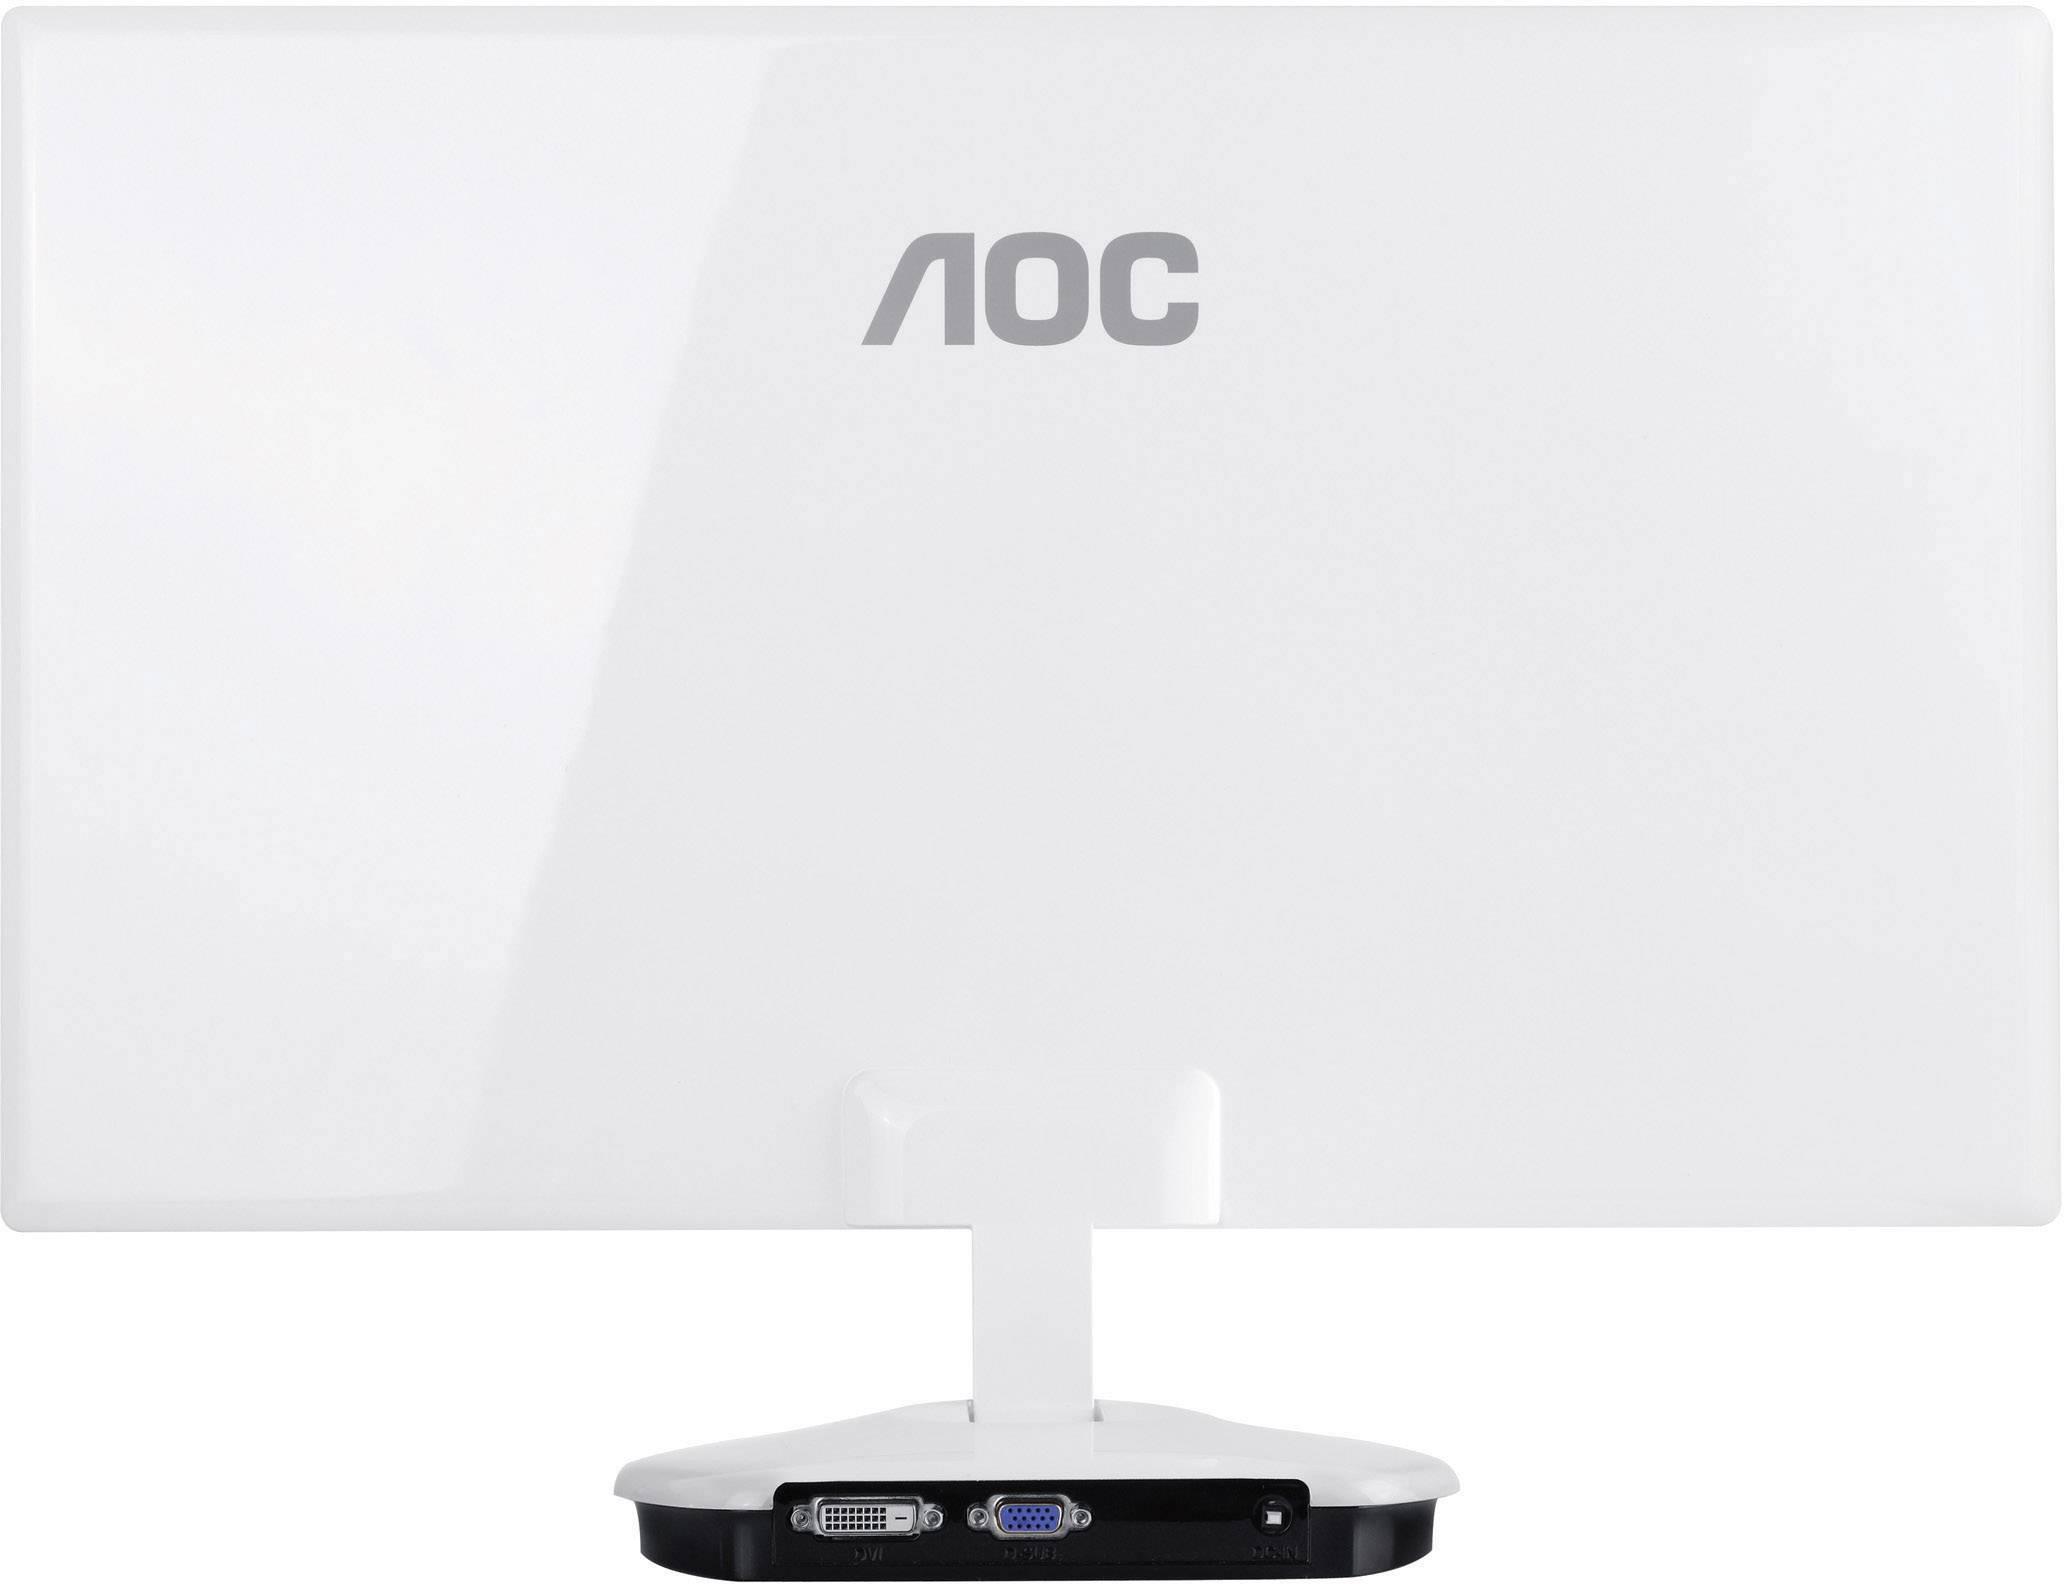 aoc e2343f monitor 23 from conrad electronic uk rh conrad electronic co uk